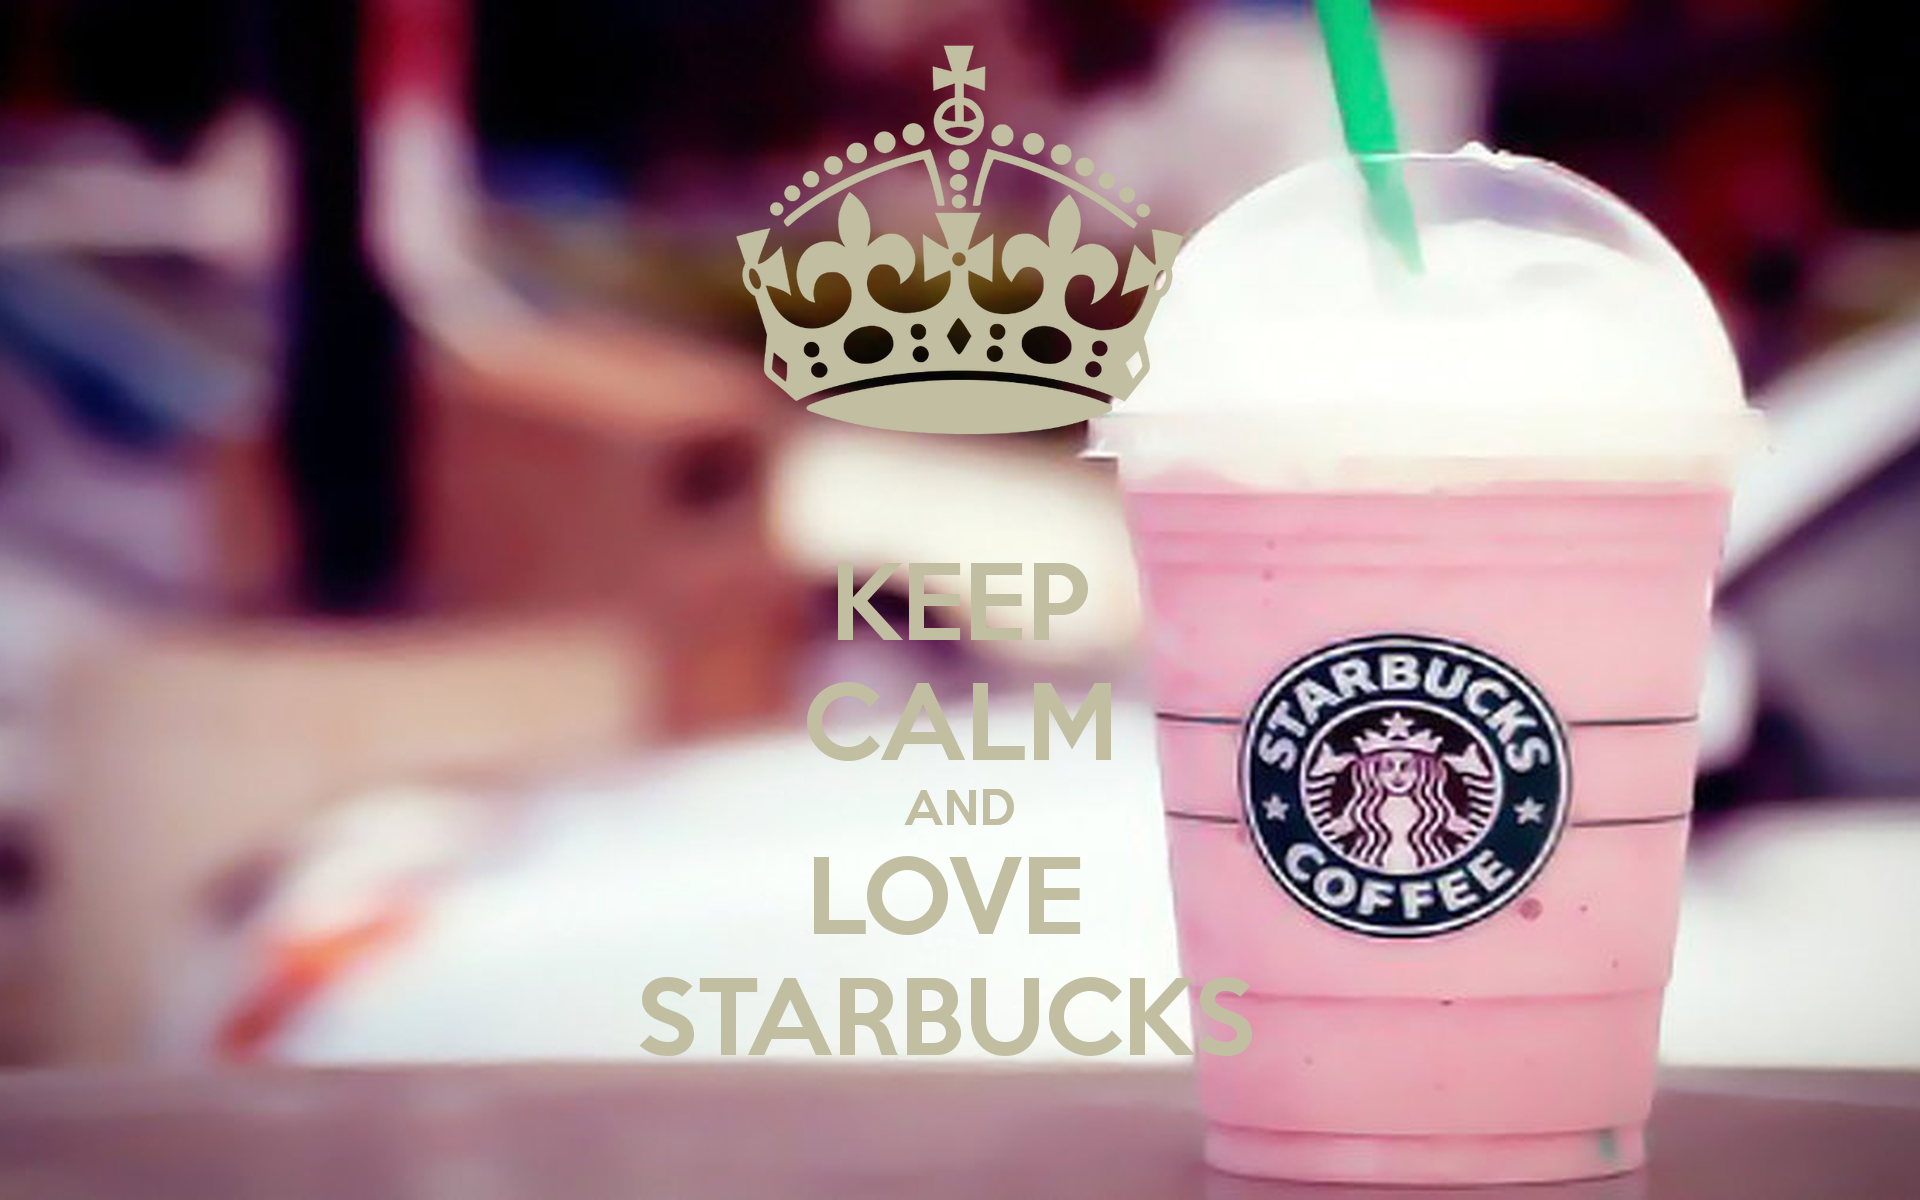 keep calm and love starbucks wallpapers Starbucks